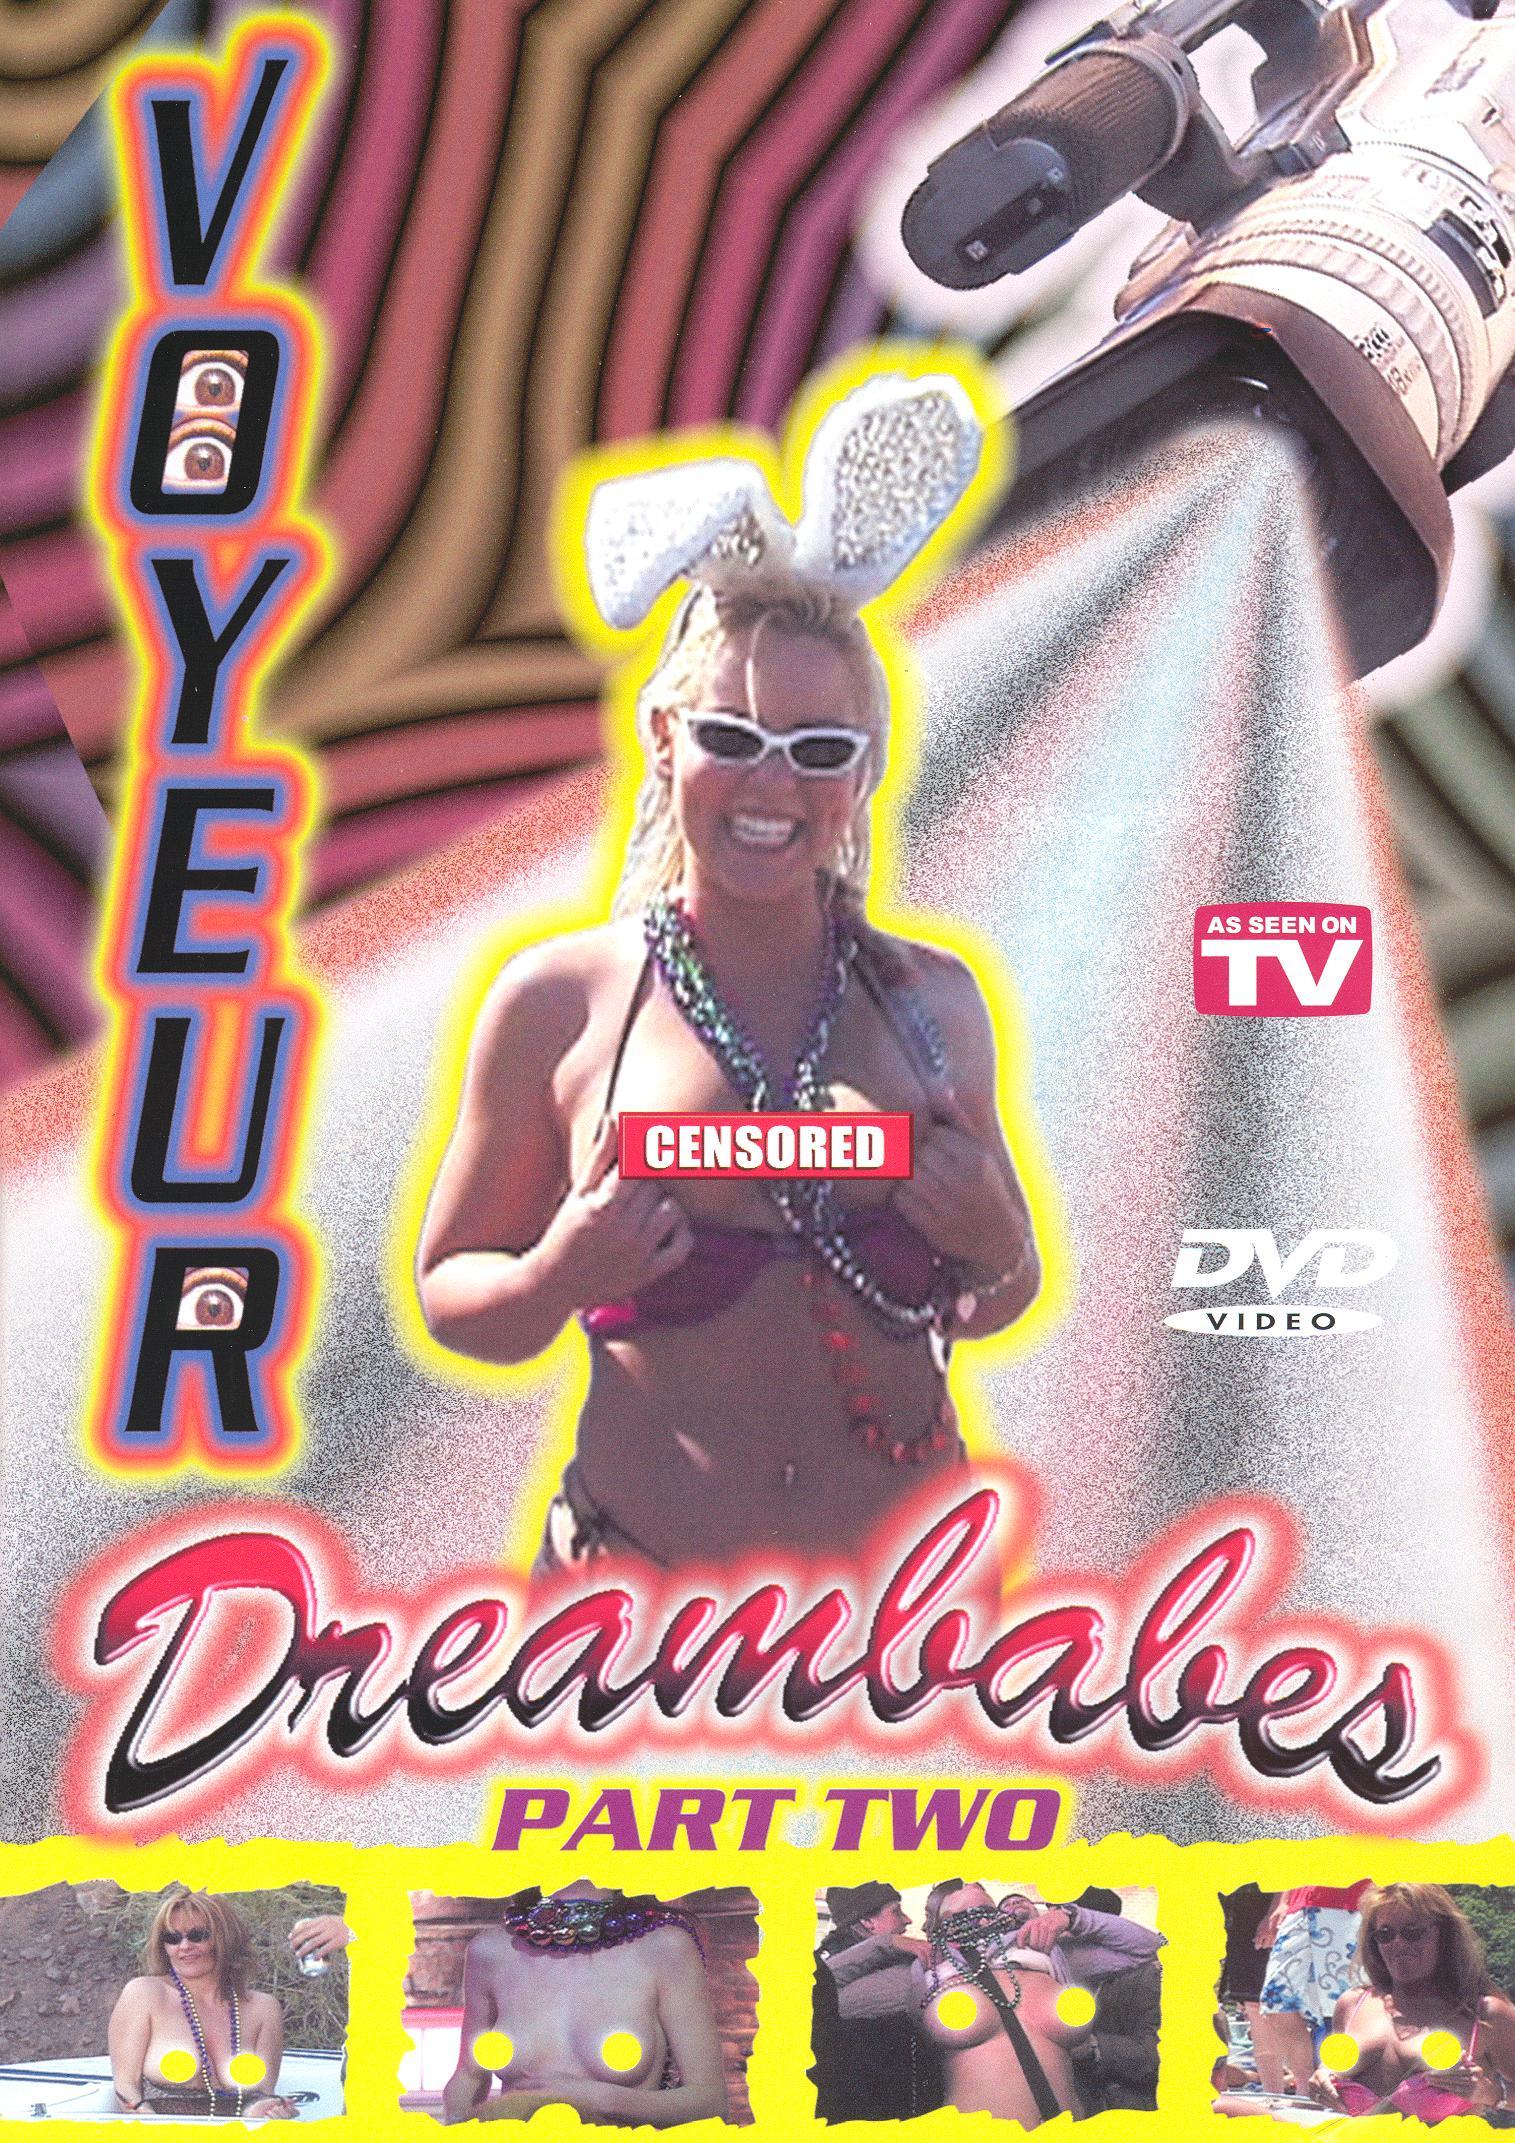 Voyeur Dreambabes, Part Two